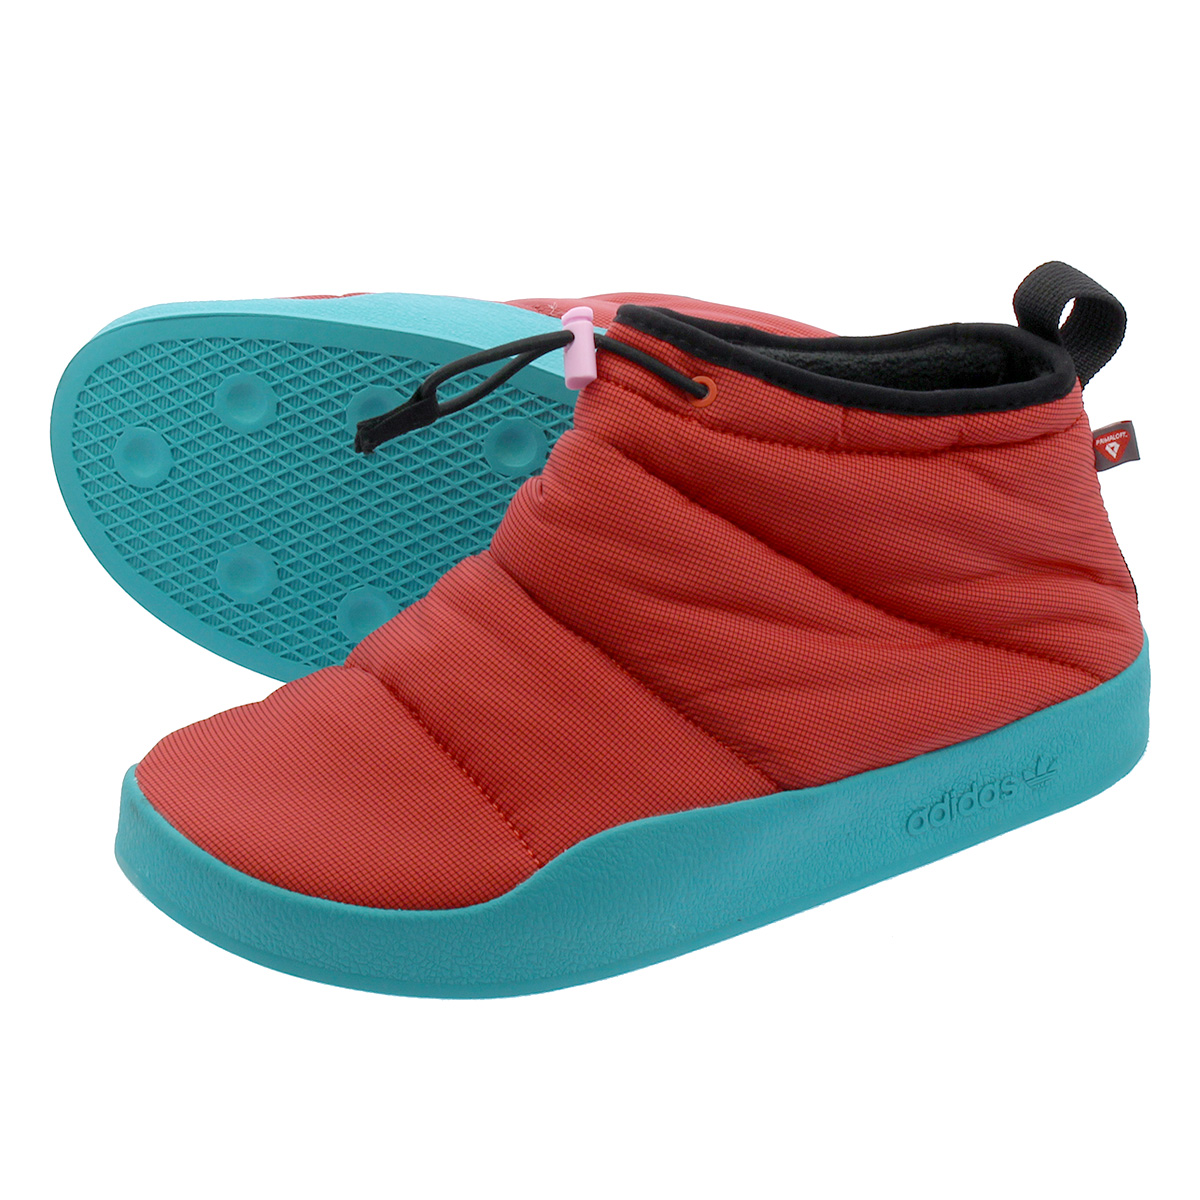 adidas ADILETTE PRIMA アディダス アディレッタ プリマ BRIGHT RED/CORE BLACK/ENERGY INK bb8102